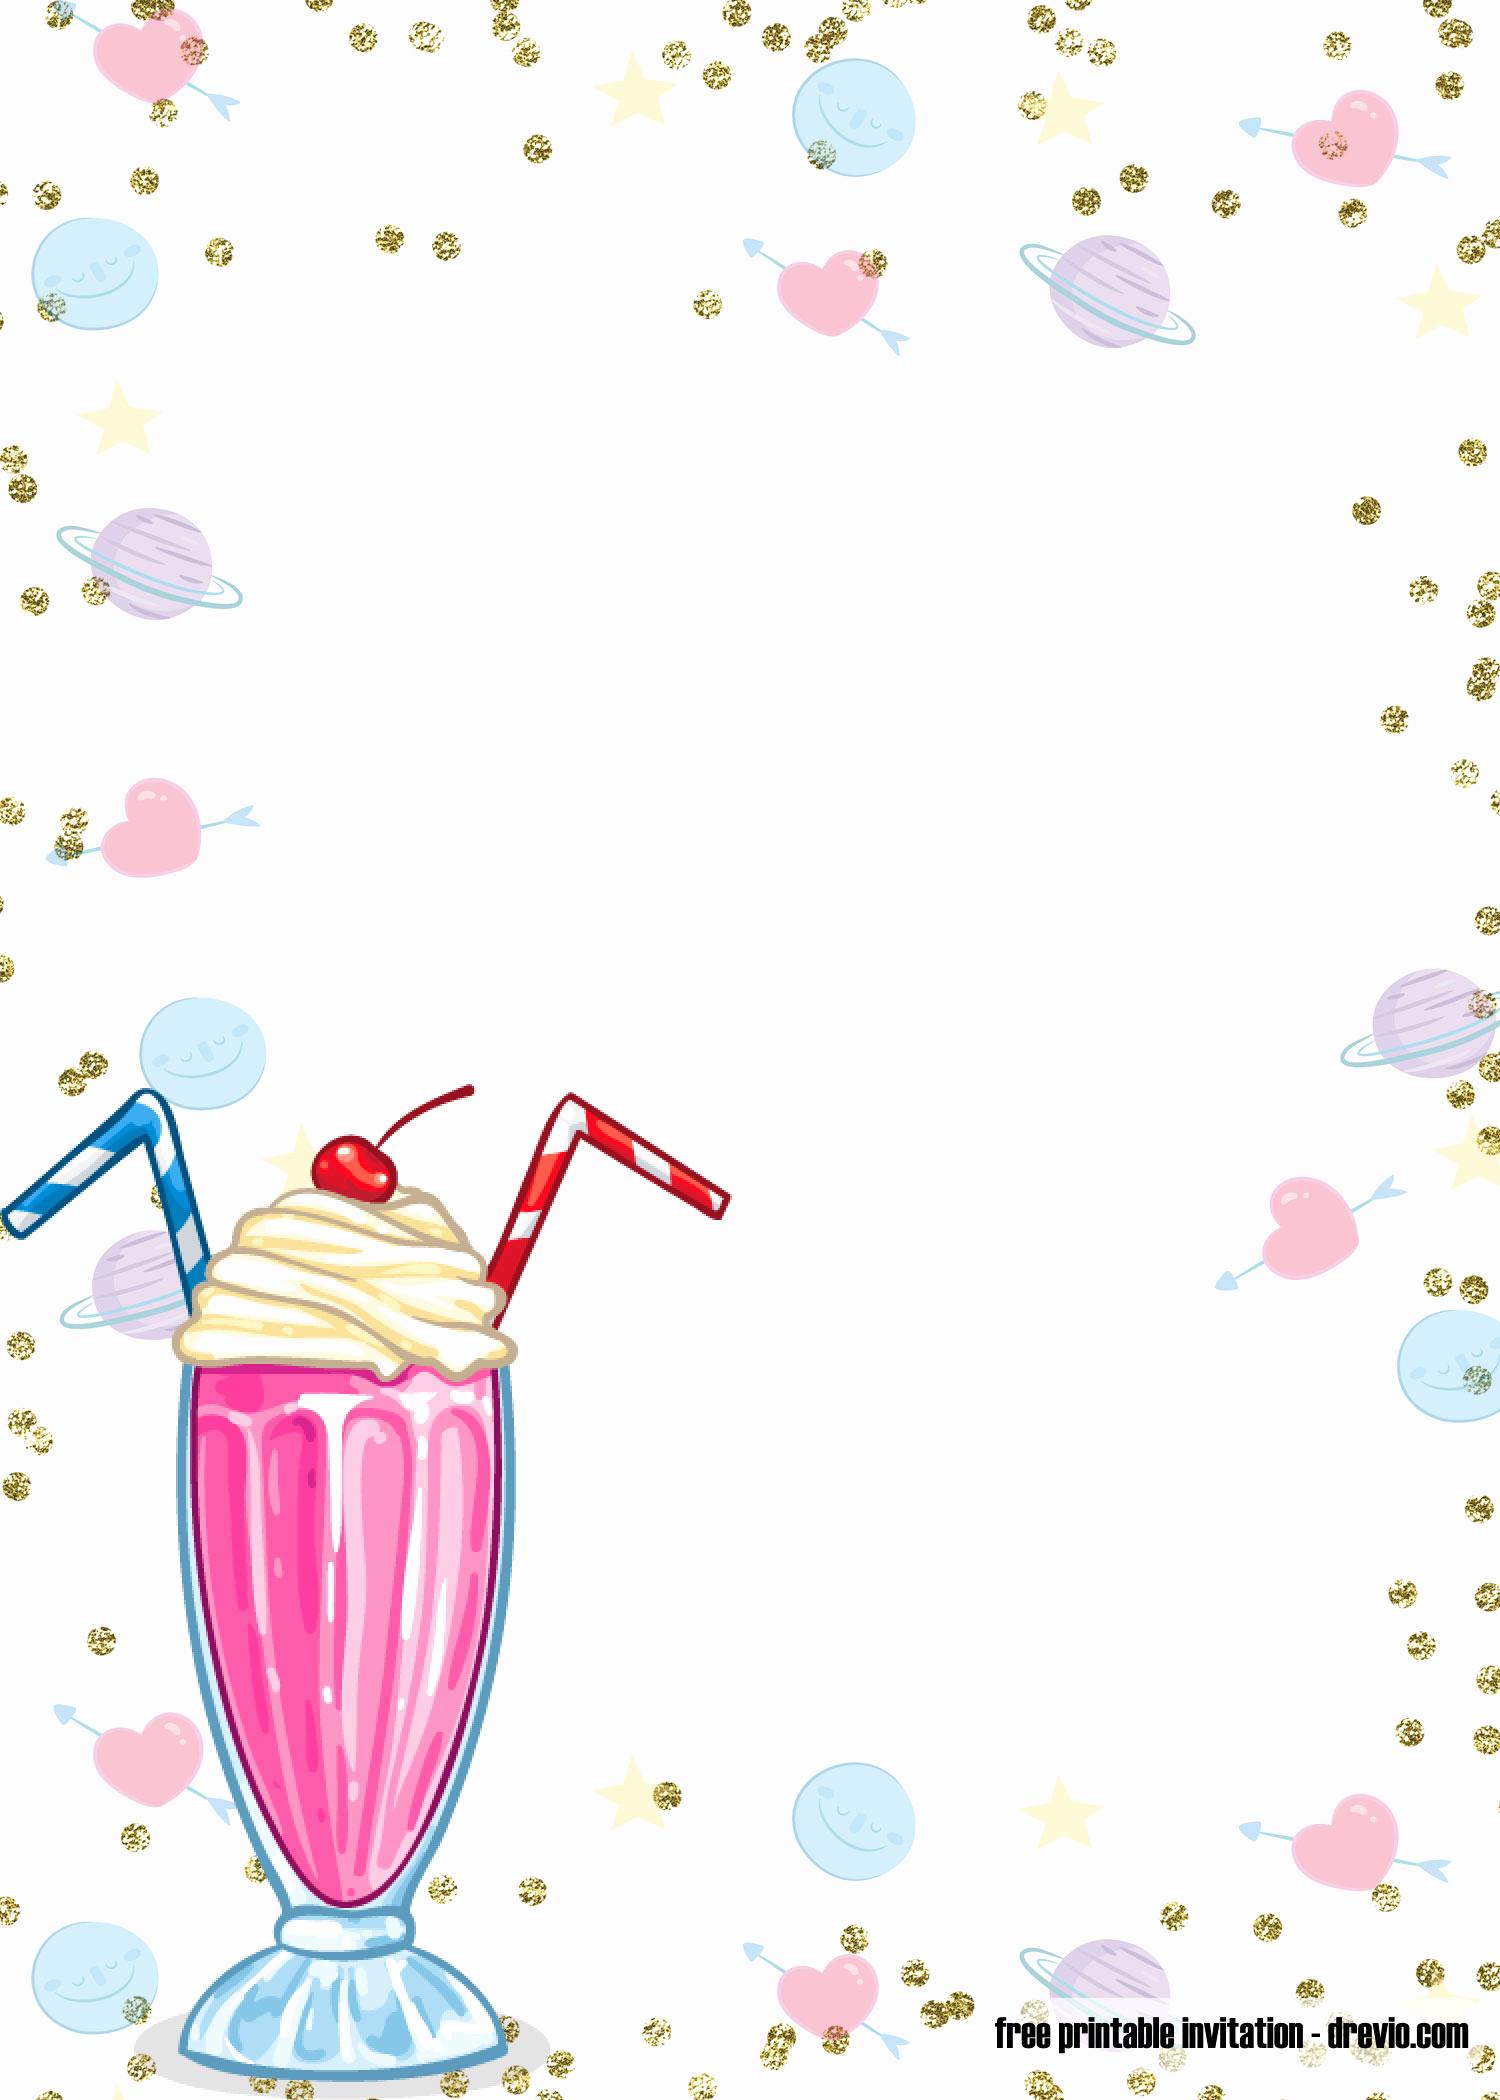 Ice Cream Invitation Template Inspirational Free Printable Ice Cream Birthday Invitation Templates